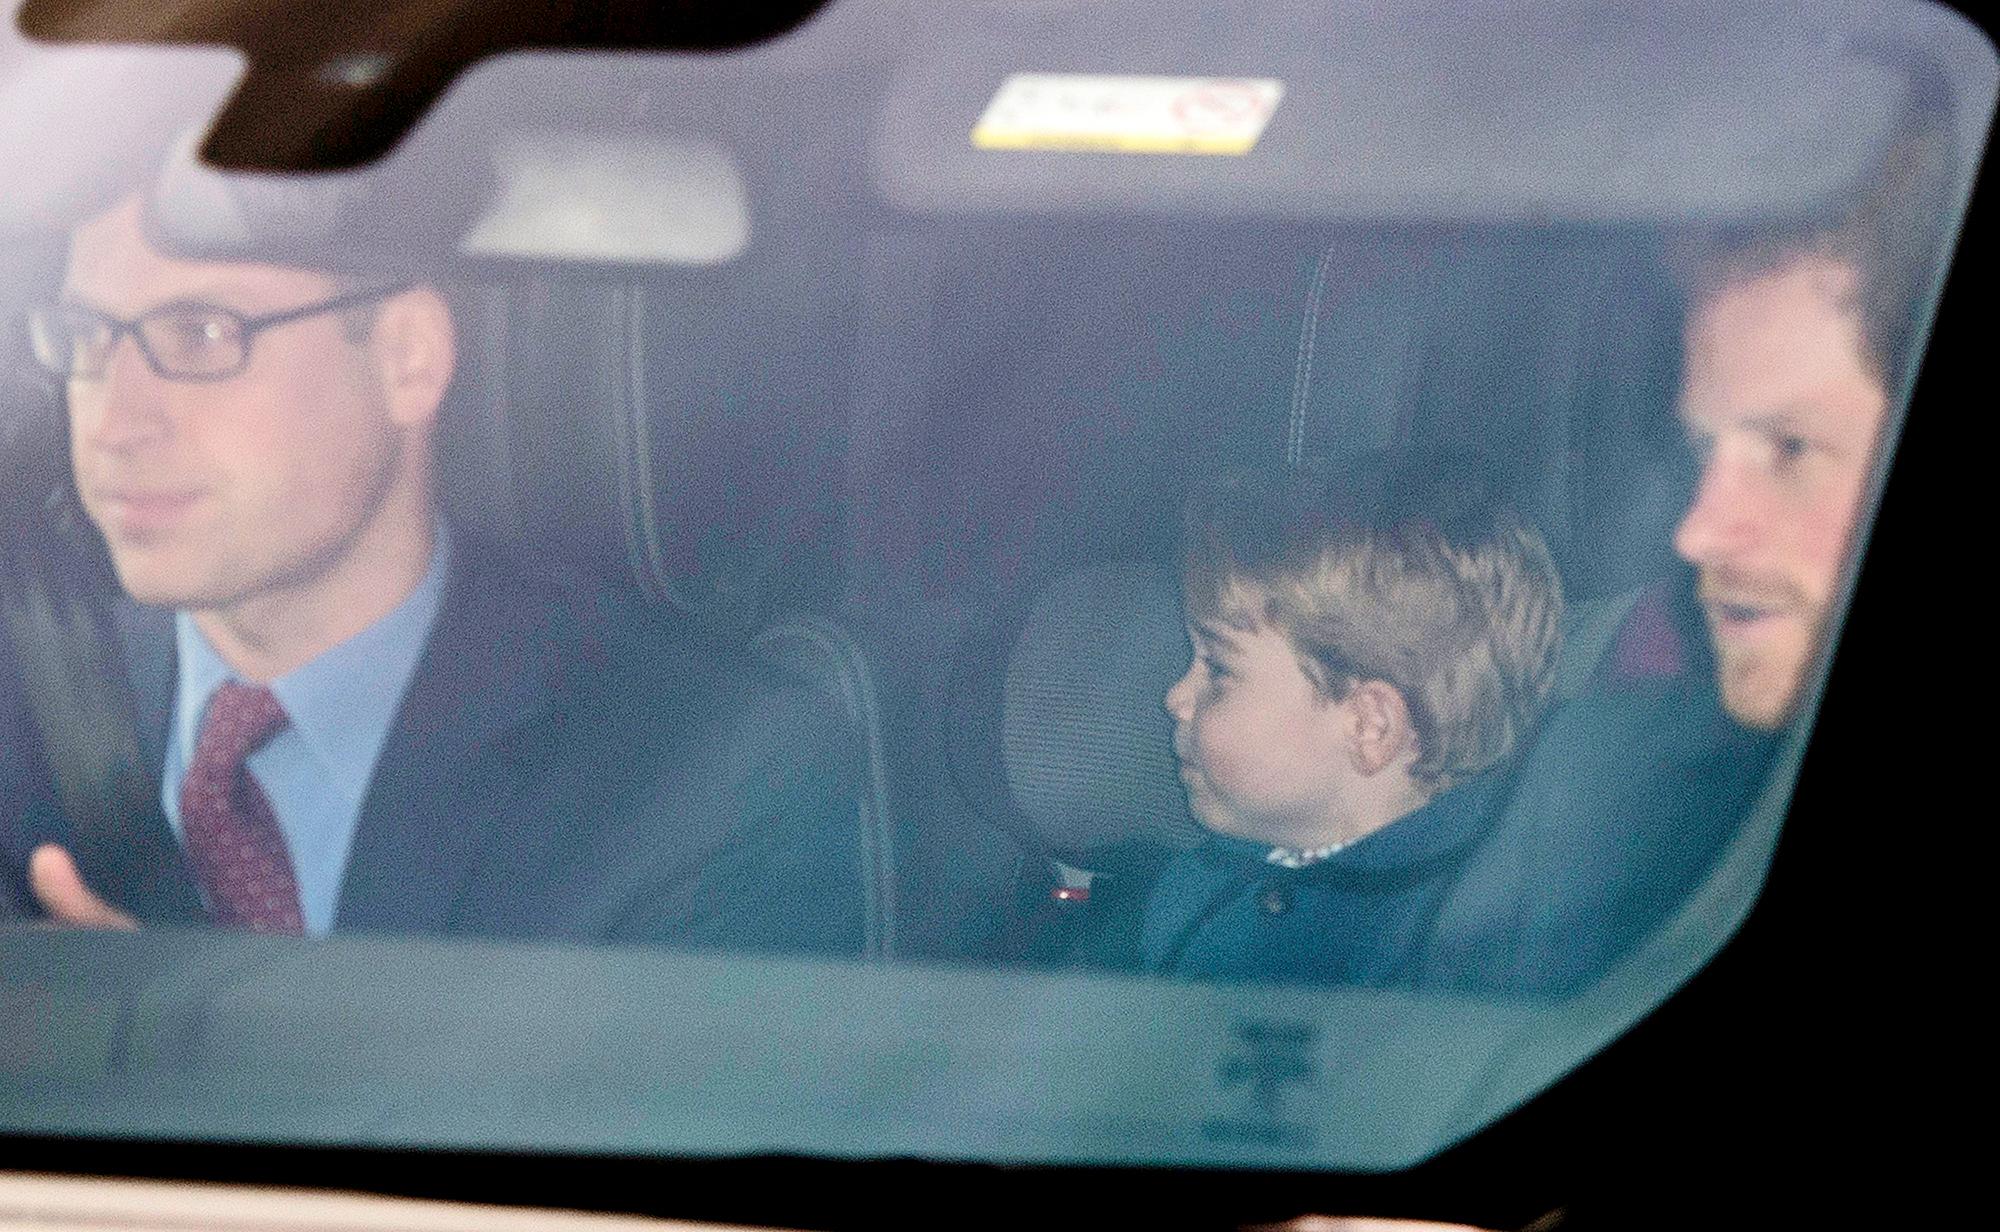 Prince William, Prince George and Prince Harry